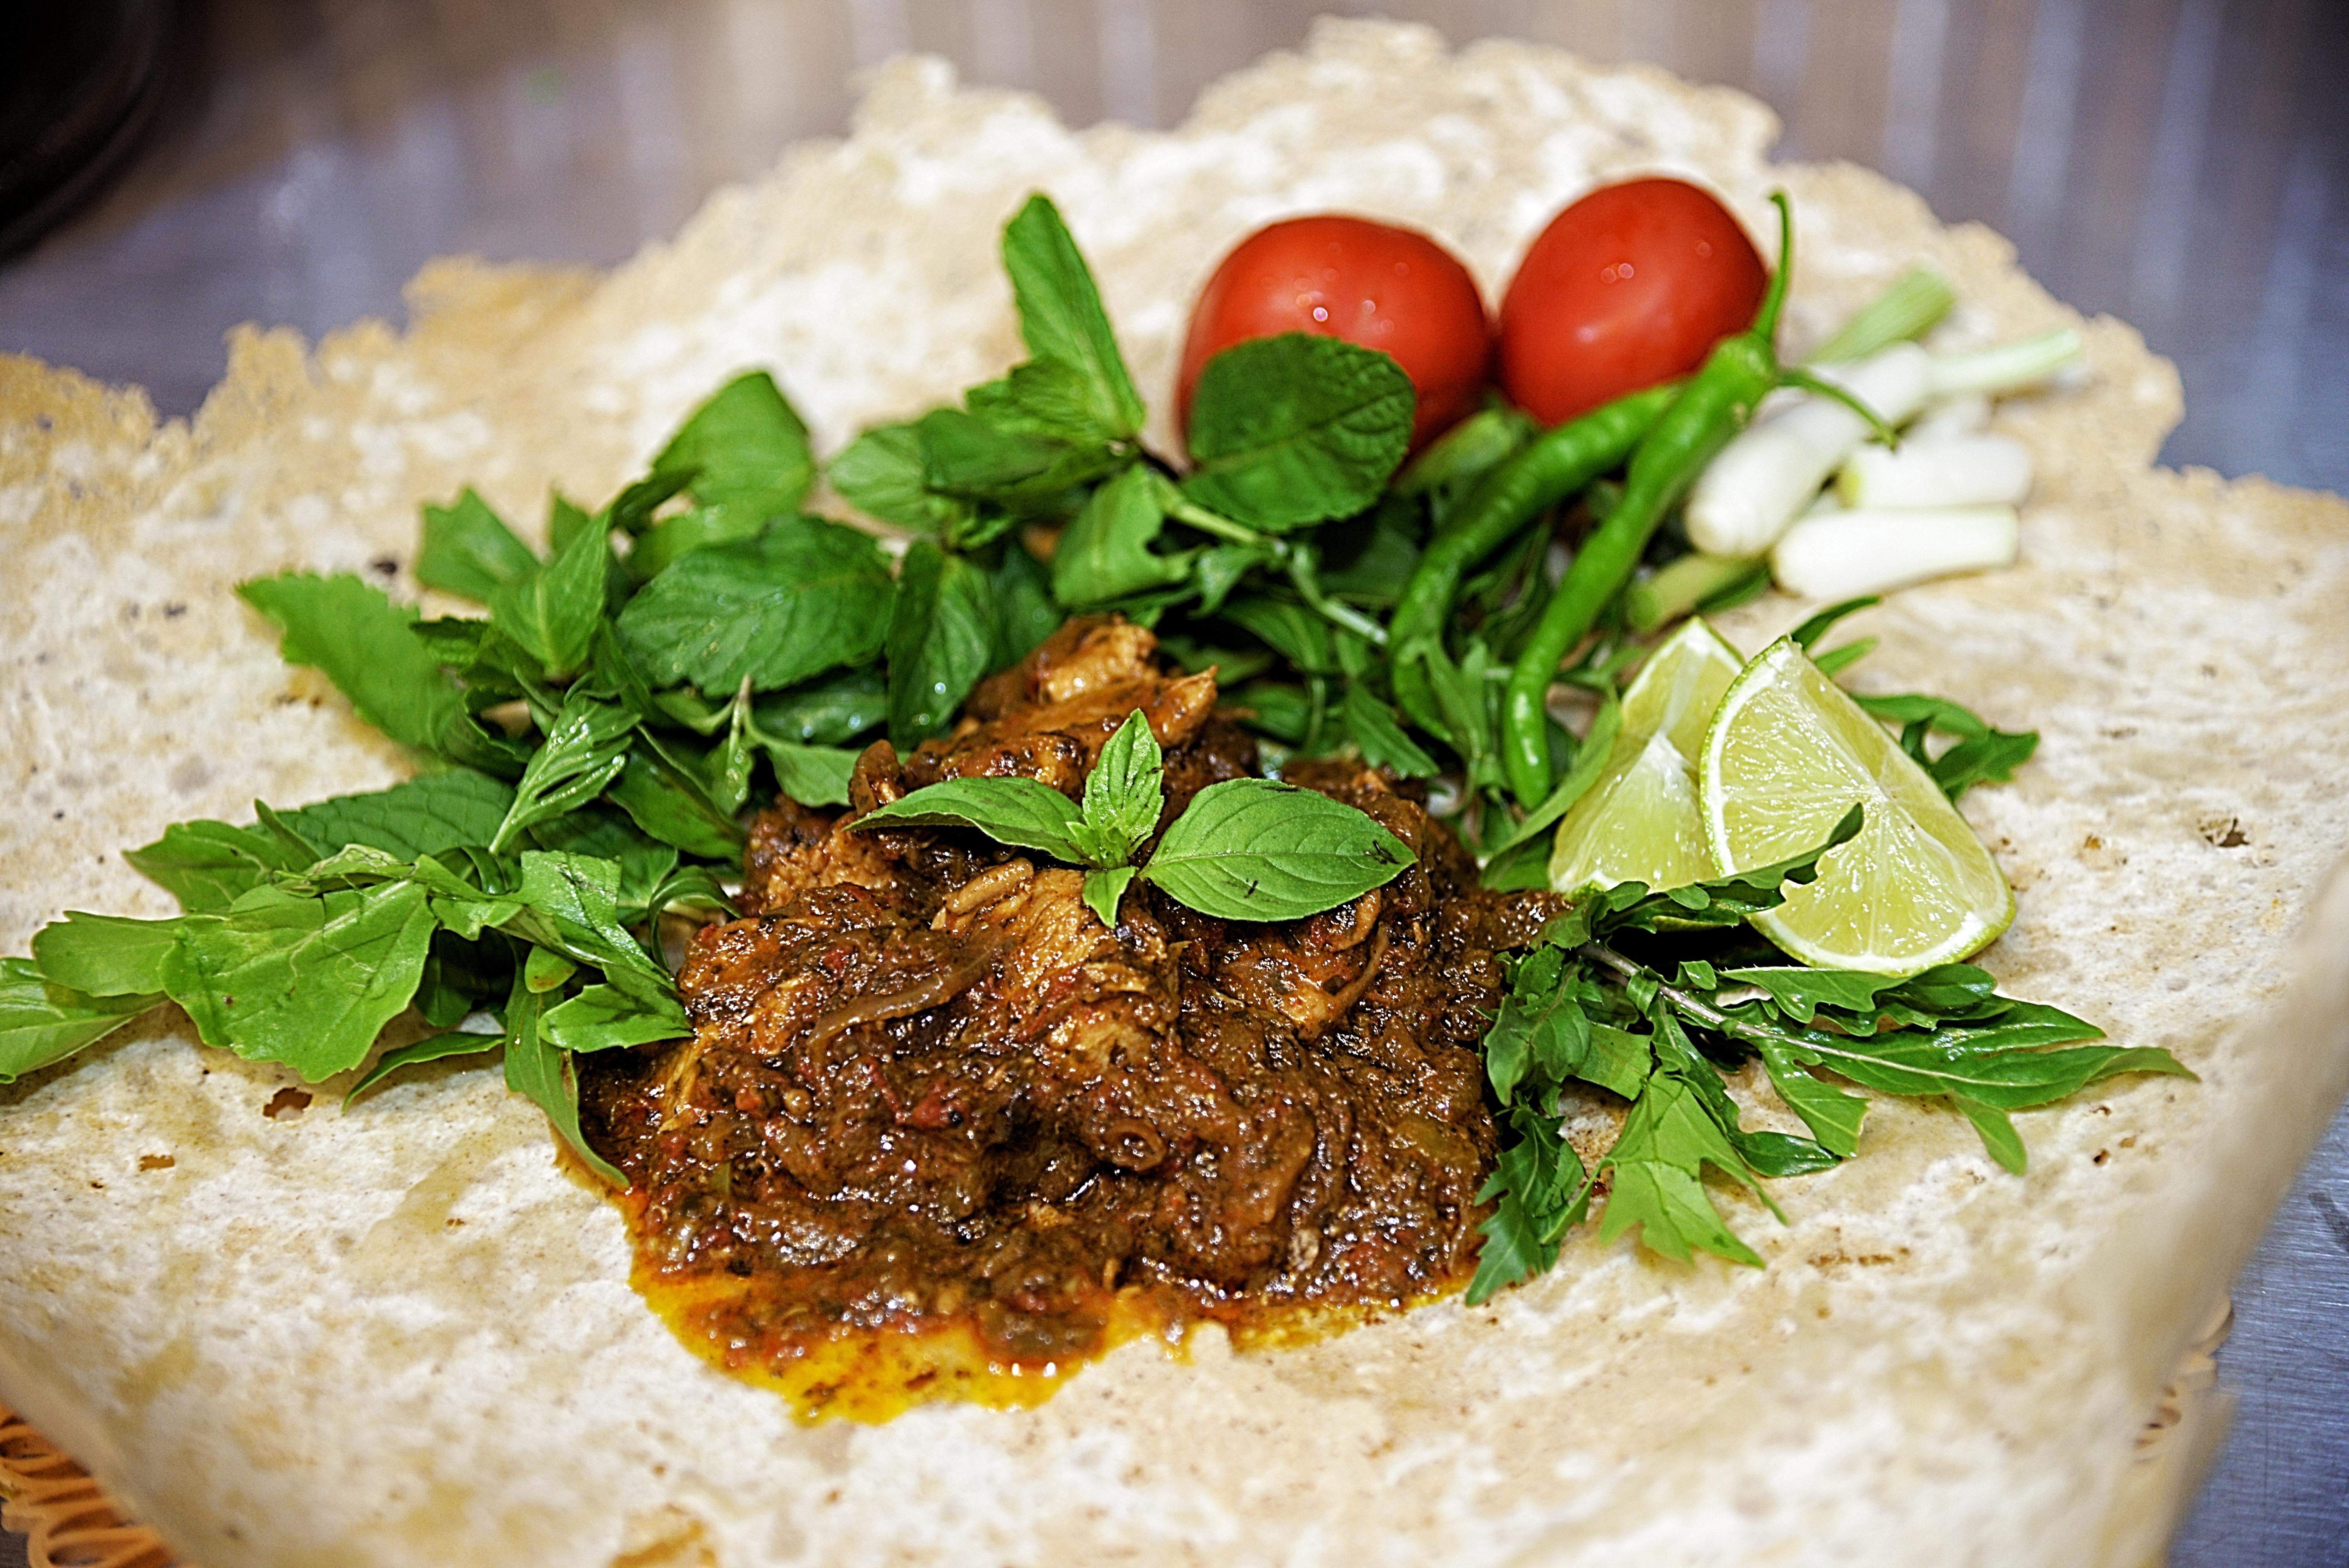 Free images photography dish vegetarian food indian cuisine photography dish food cuisine vegetarian food indian cuisine asian food middle eastern food recipe mediterranean food forumfinder Gallery